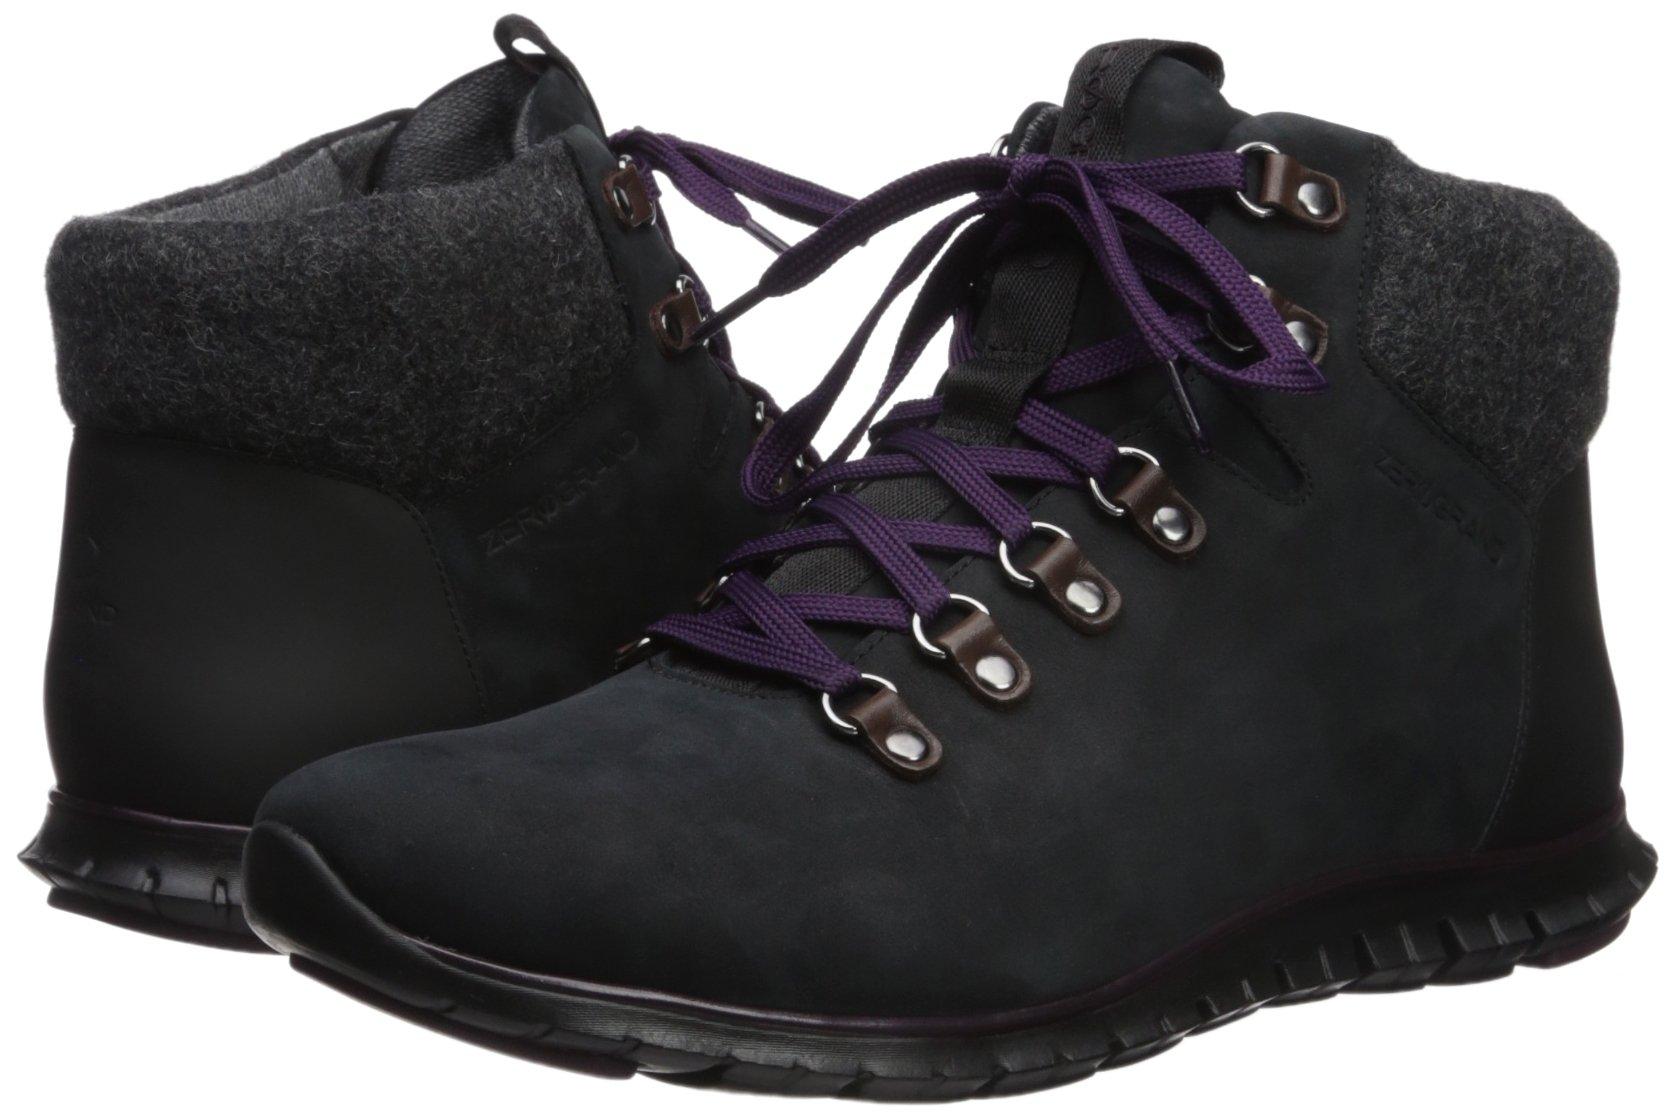 Cole Haan Women's Zerogrand Hikr Boot, Black, 9.5 B US by Cole Haan (Image #6)